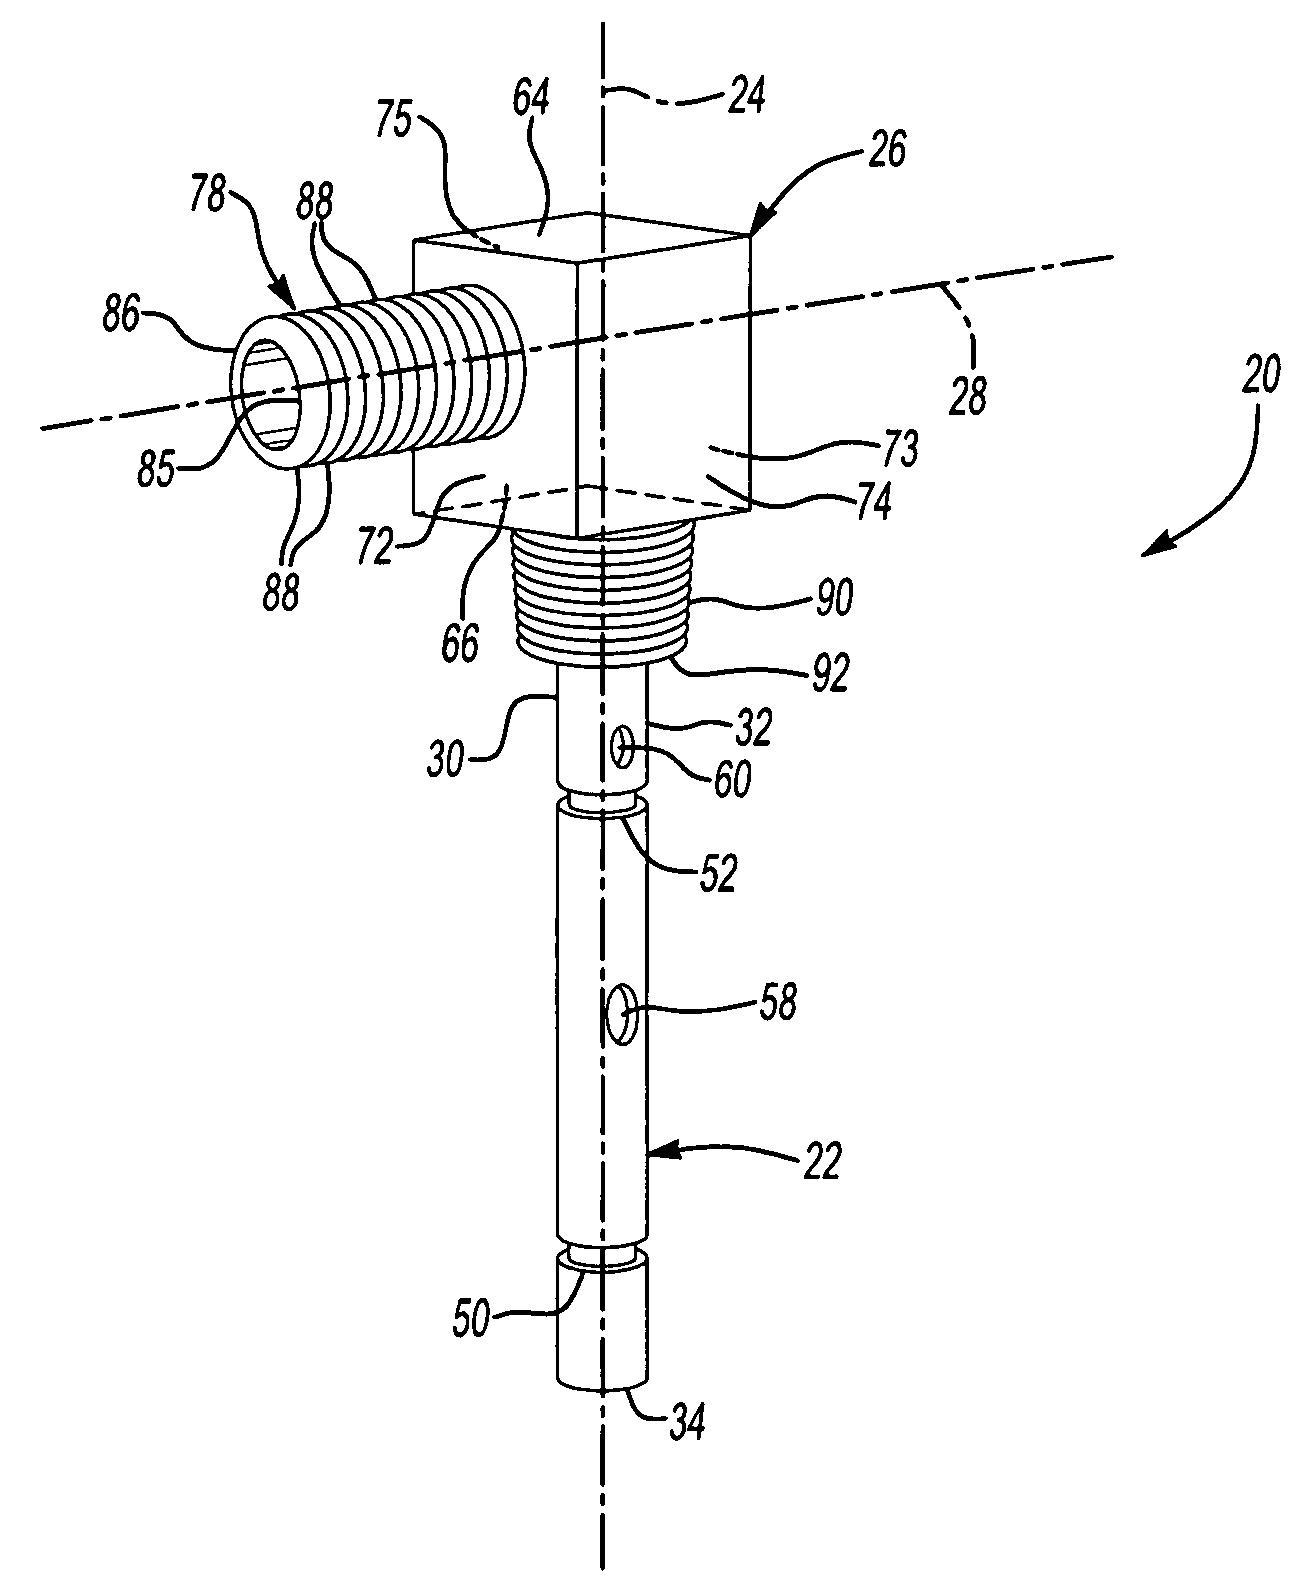 patent us7225826 - marine fuel tank vent valve